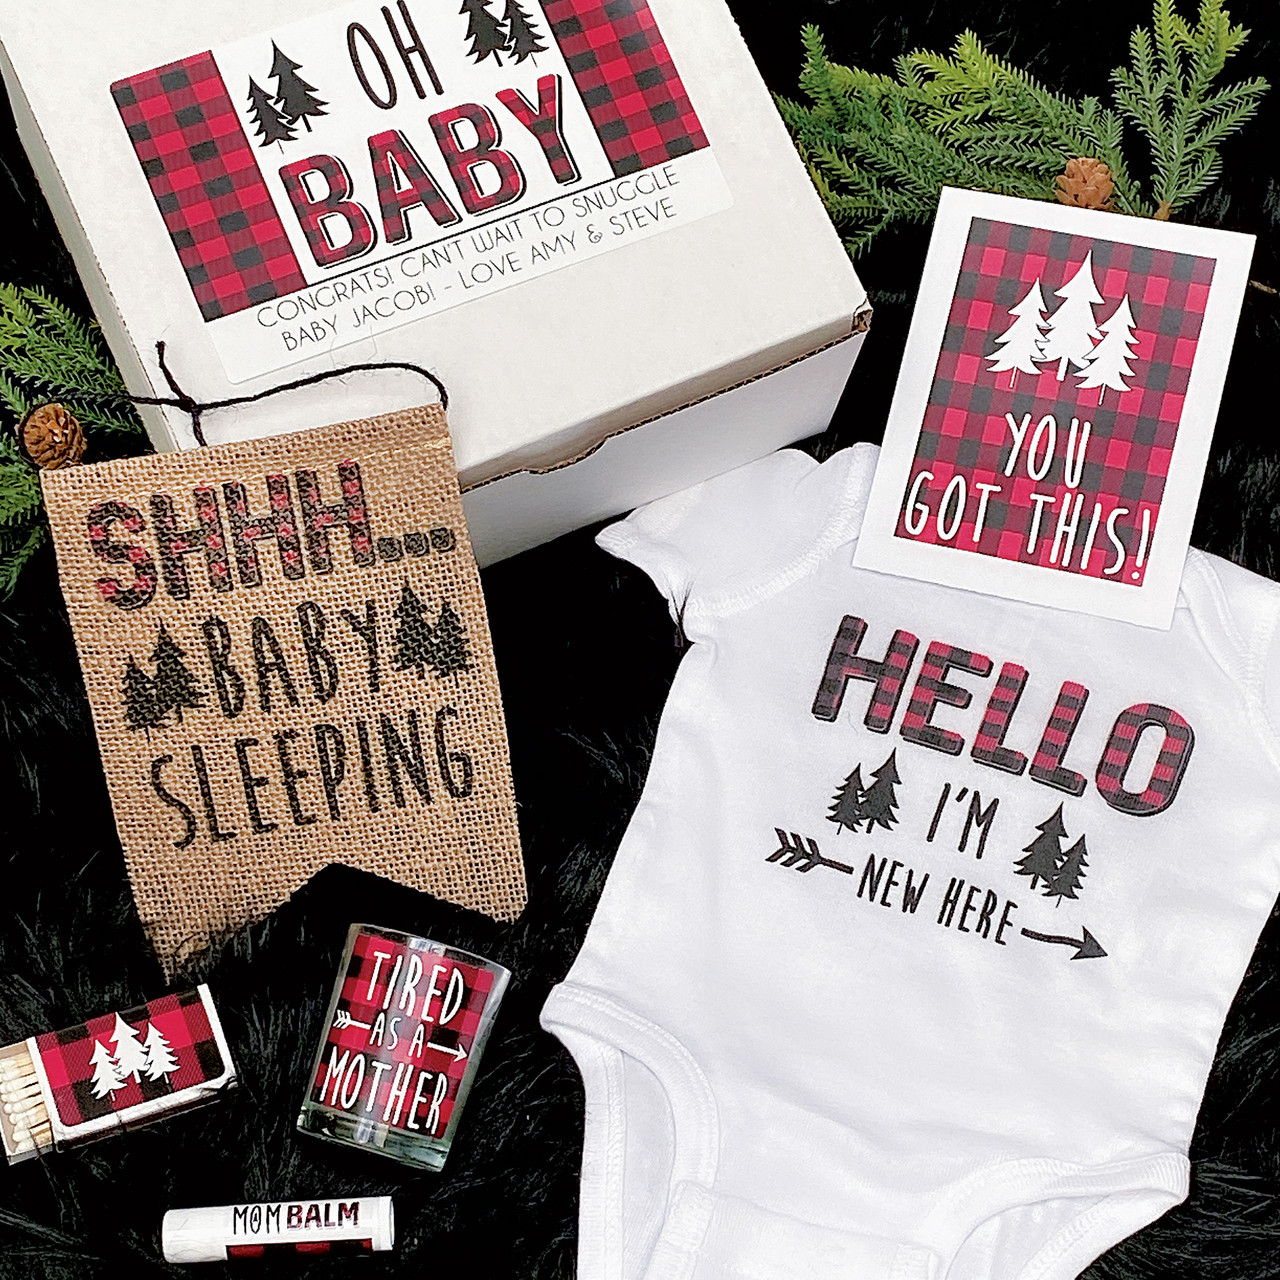 "Shop Custom Baby Shower Gifts"">         </a>         <a href="